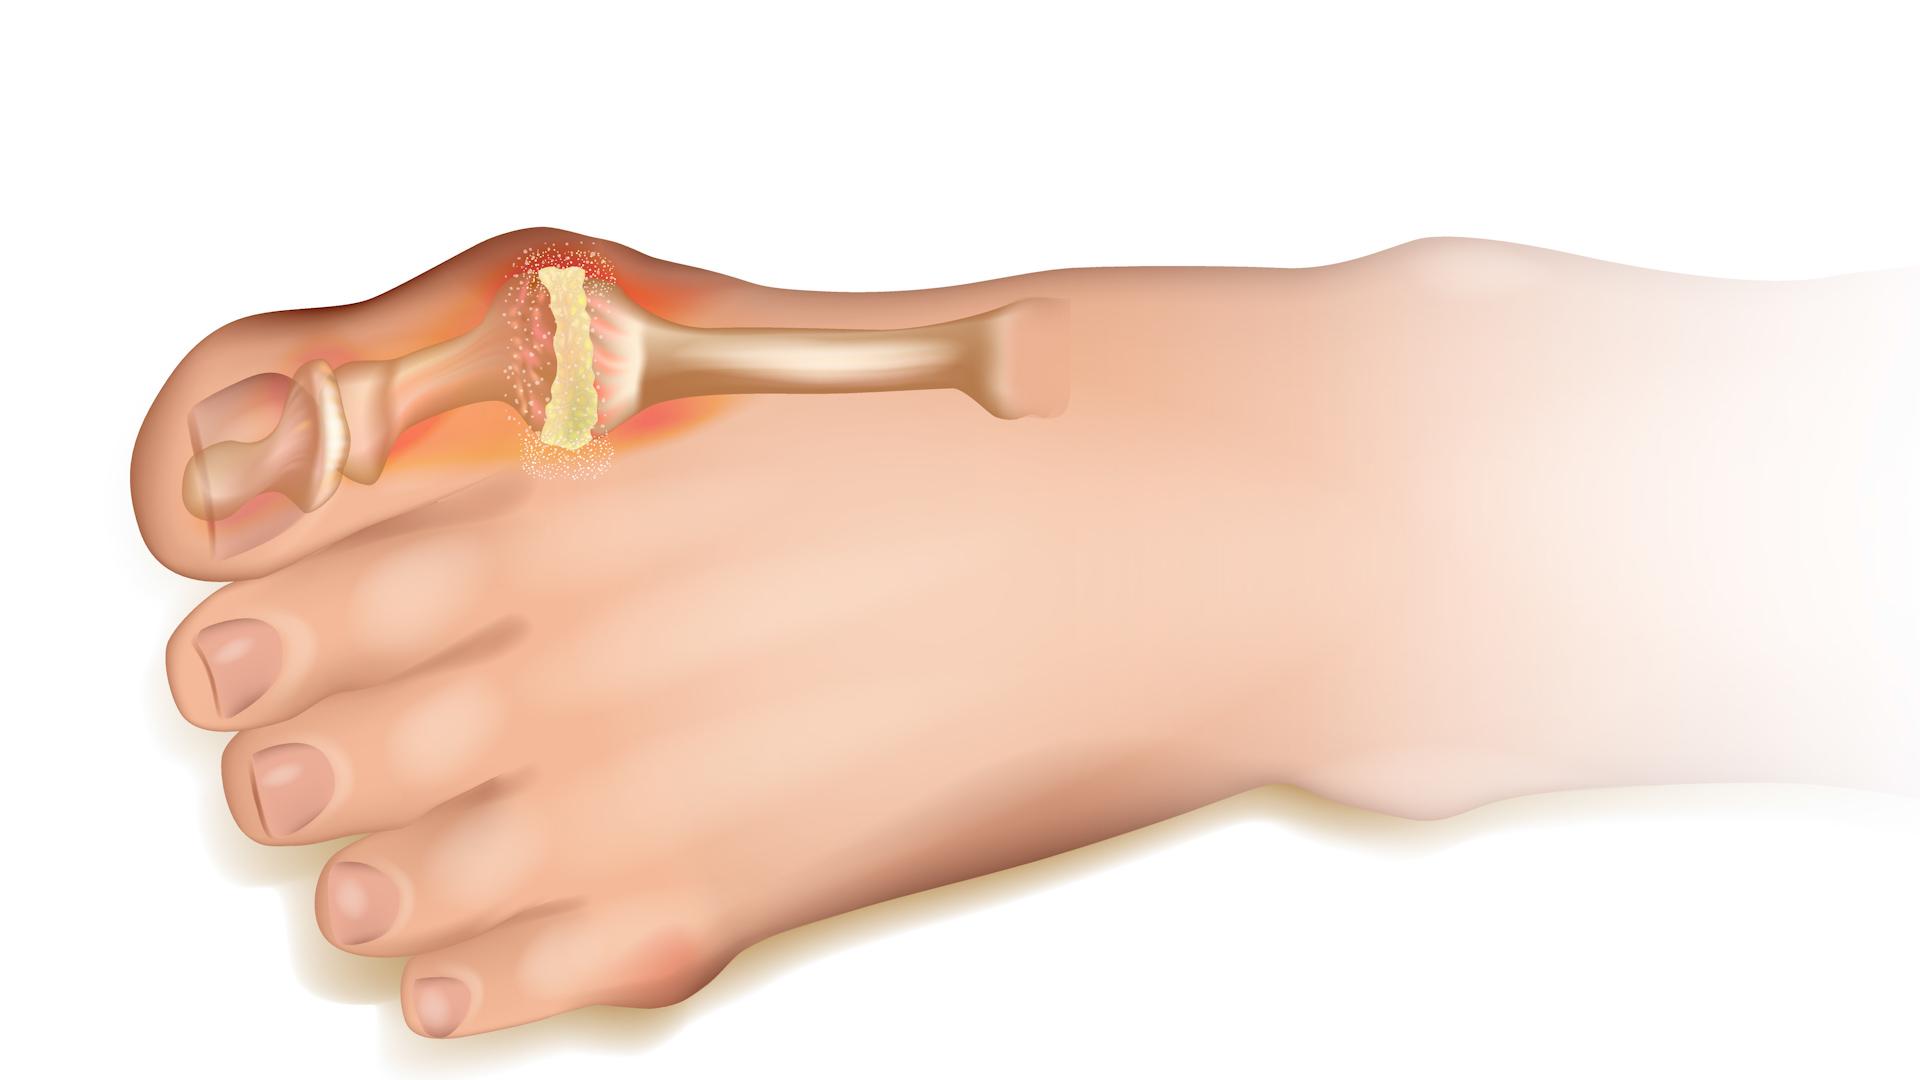 Мазь для лечения связок кисти руки